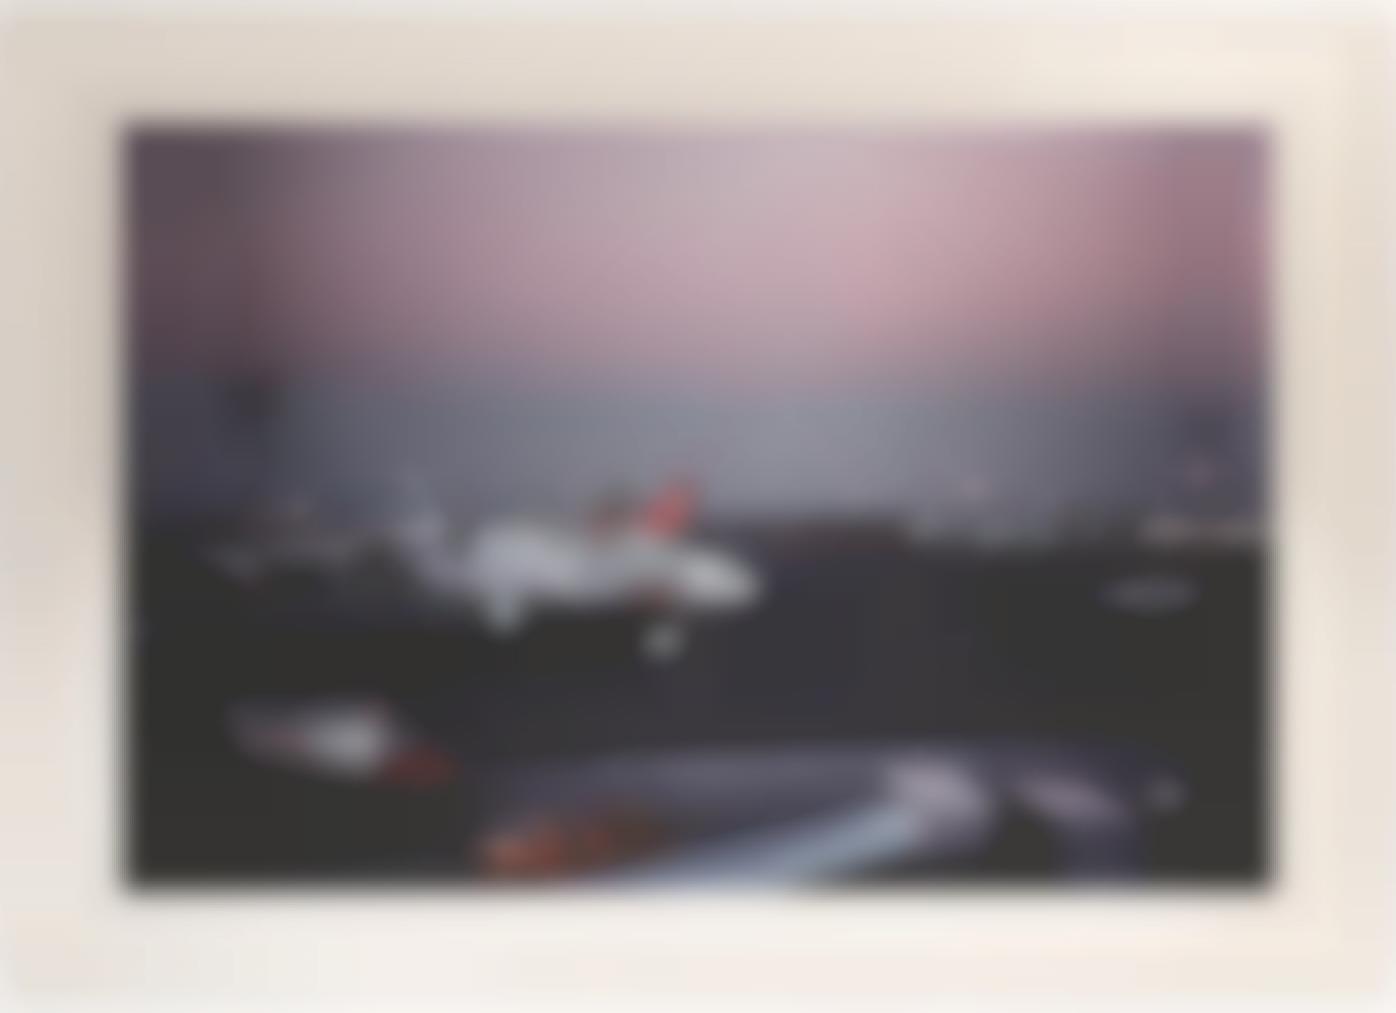 Peter Fischli & David Weiss-Sas Und Swiss Air, Ny (Sas And Swiss Air, Ny)-1989